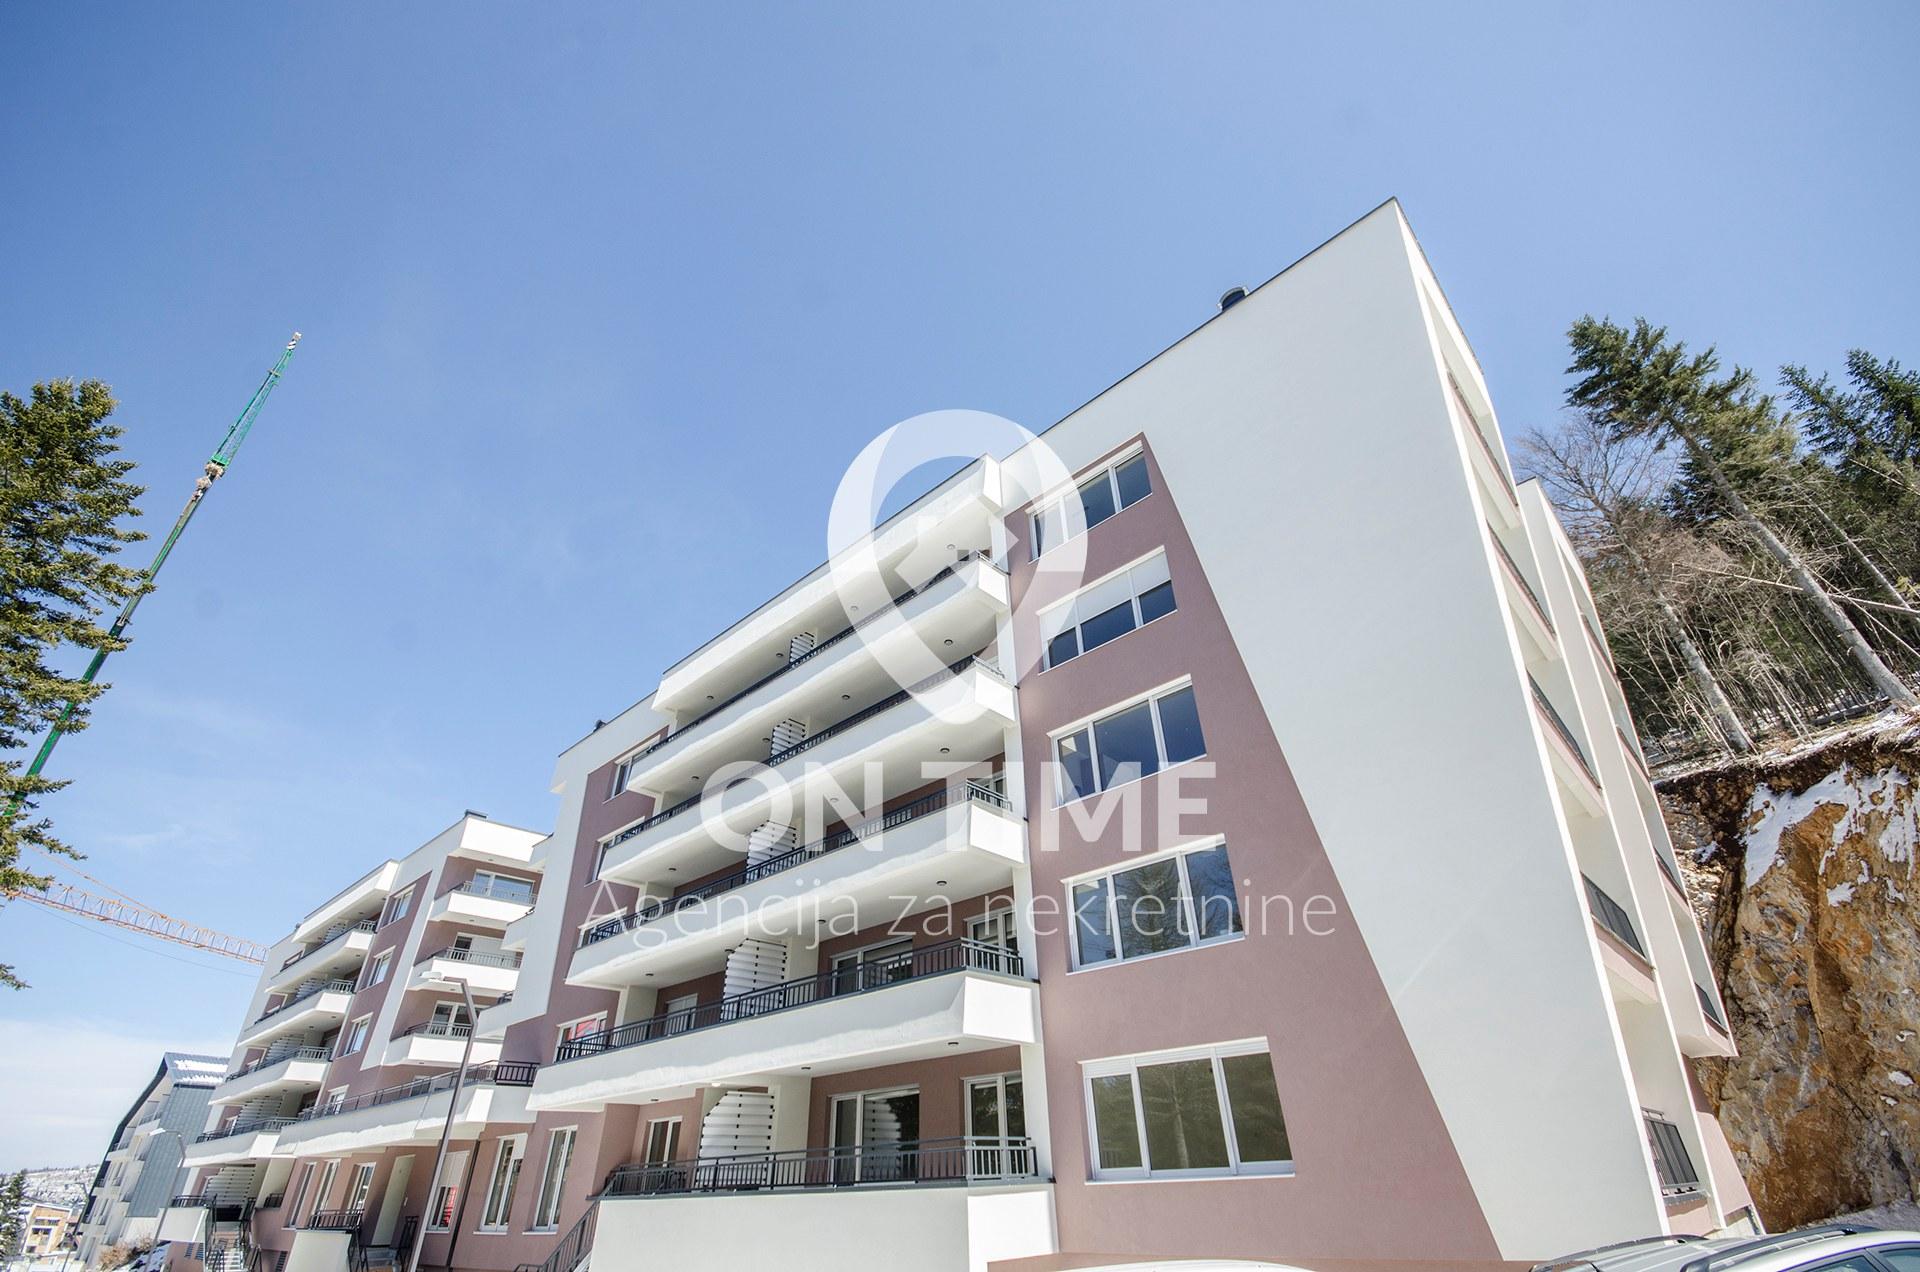 Apartman u novogradnji, Bjelašnica, 68 m2